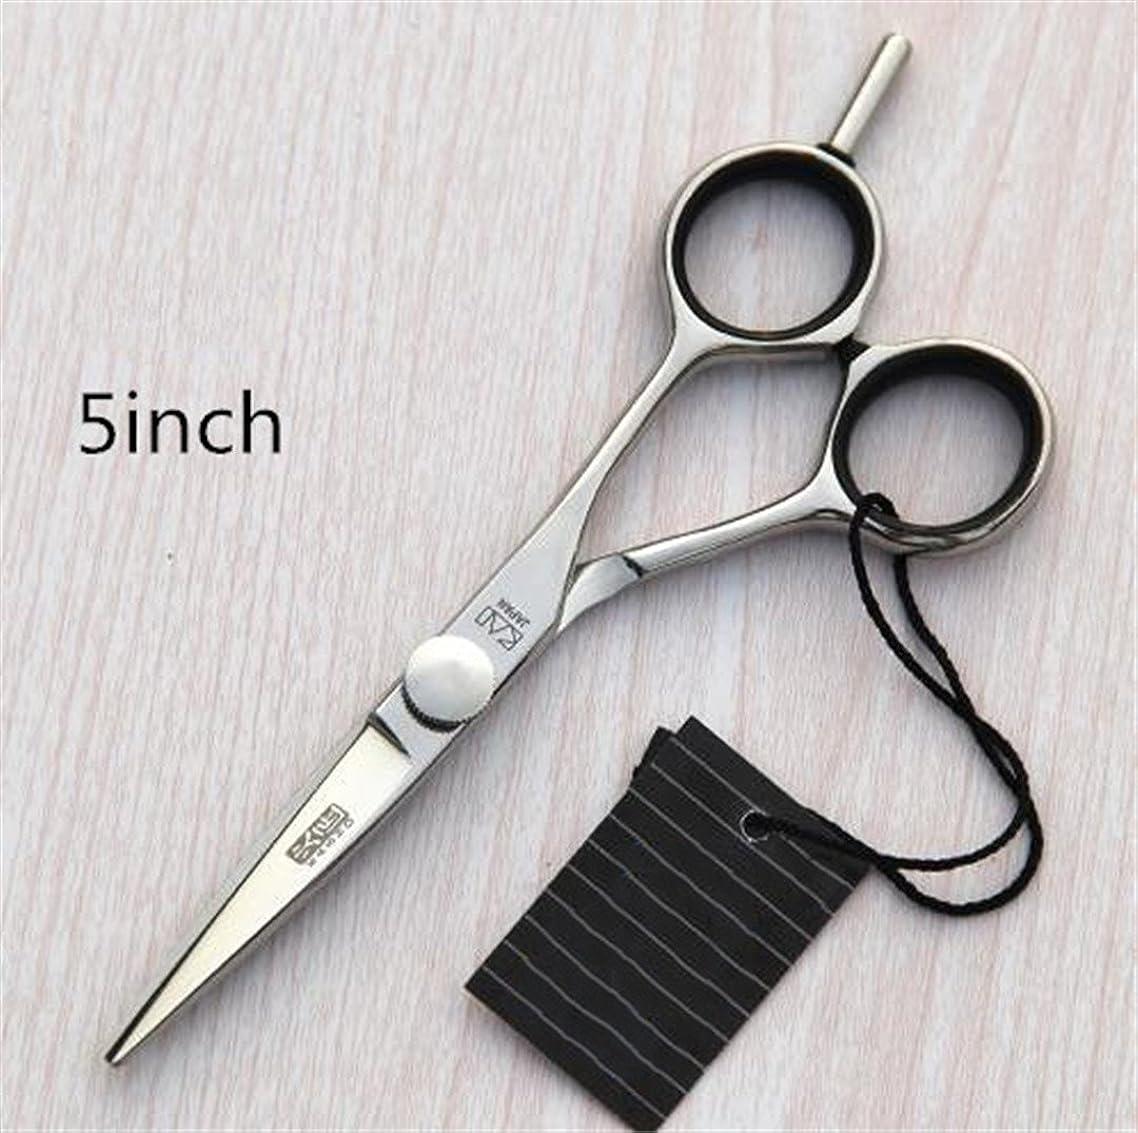 Jiansy 5.0 Or 5.5 Or 6.0 Inch Hair Cutting Scissors/Hair Shears/Barber Scissors/Hairdressing Scissors 5 Point 5 INCH